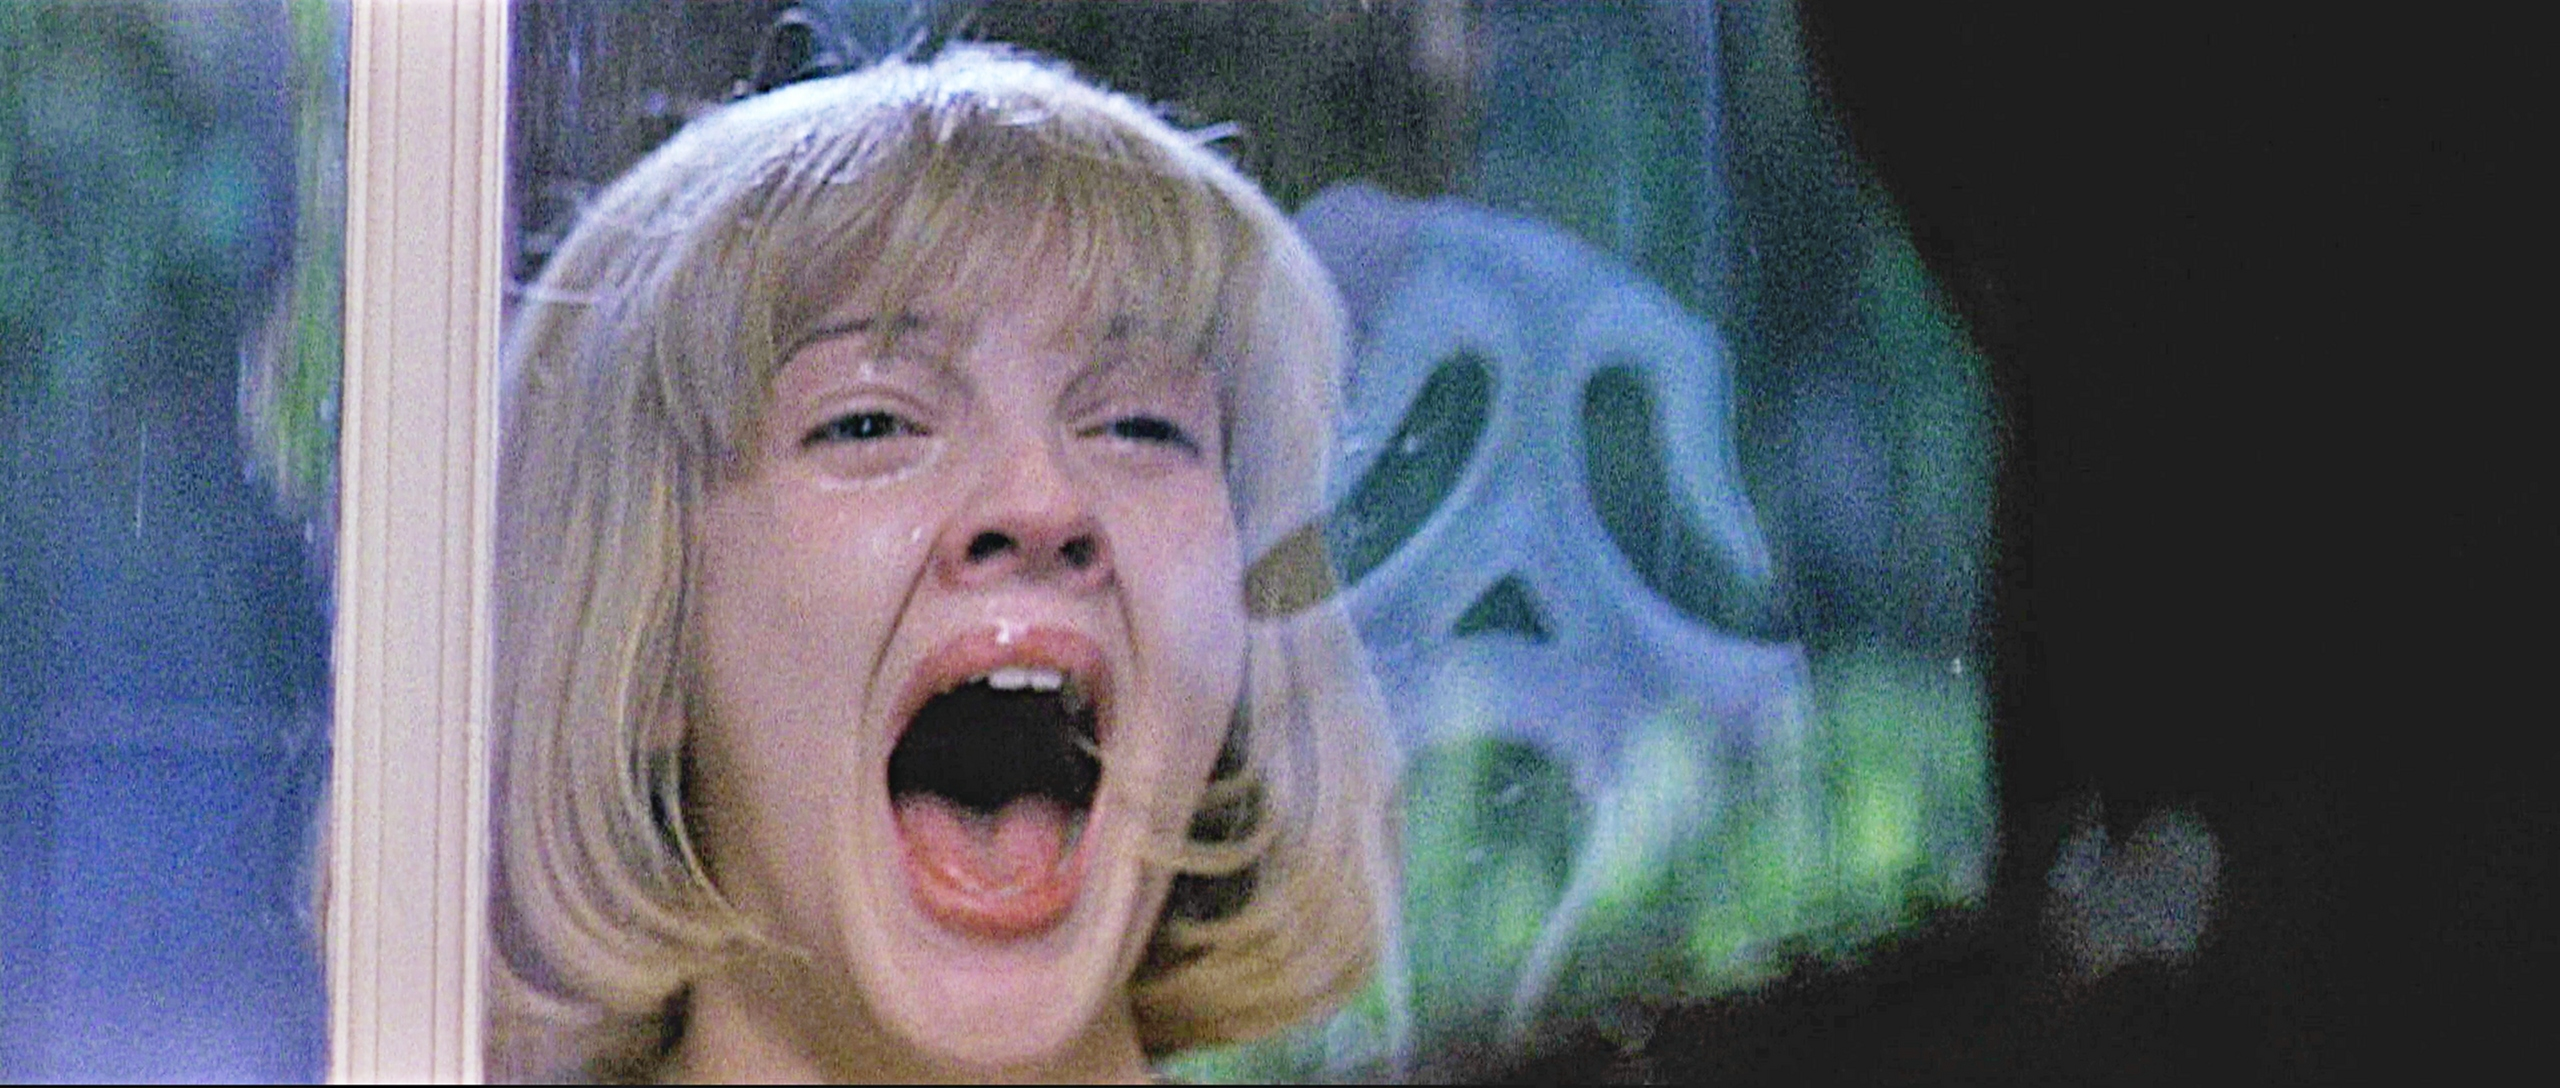 Drew Barrymore in SCREAM (1996) | Miramax